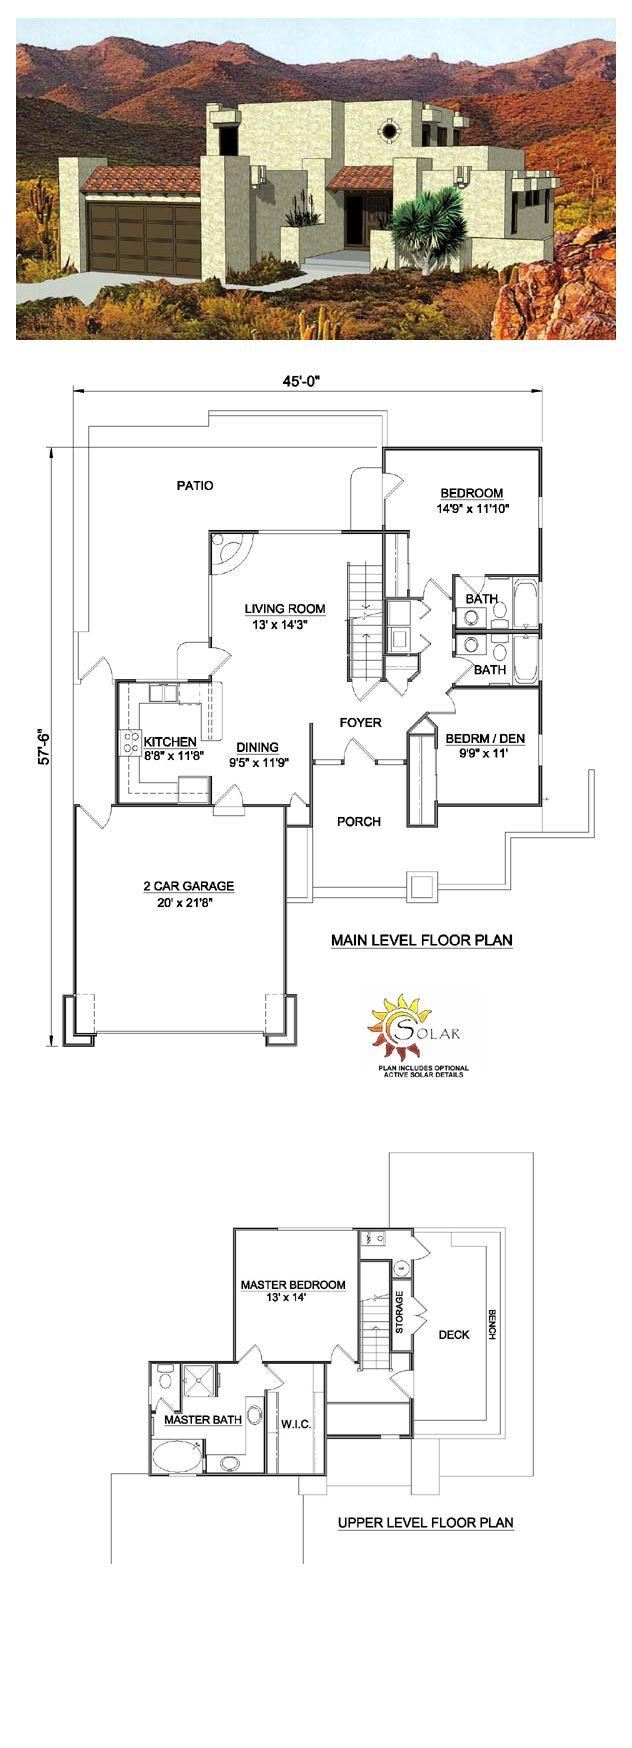 138 best house plans images on pinterest architecture modern 138 best house plans images on pinterest architecture modern houses and small houses